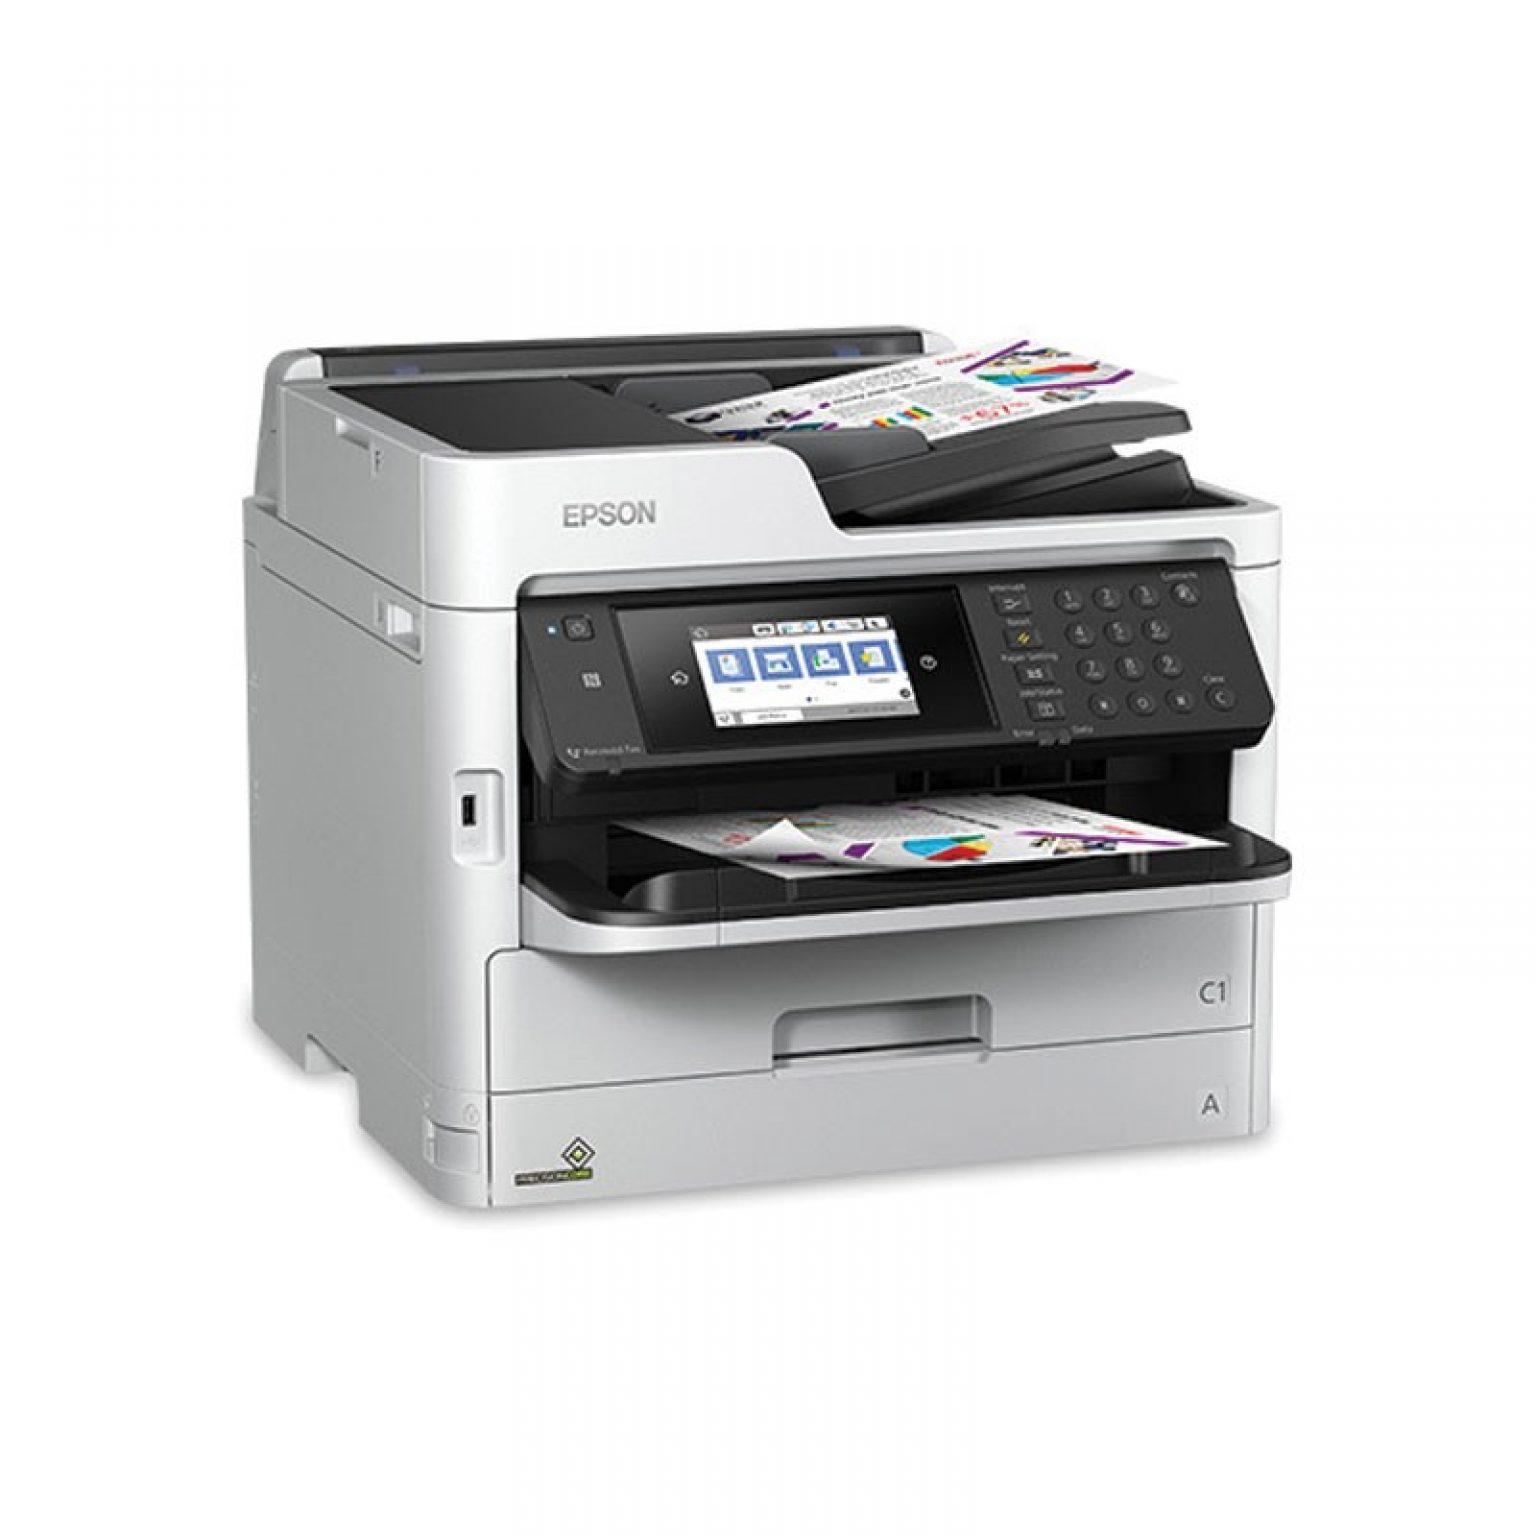 EPSON - WF C5790 Inkjet Printer